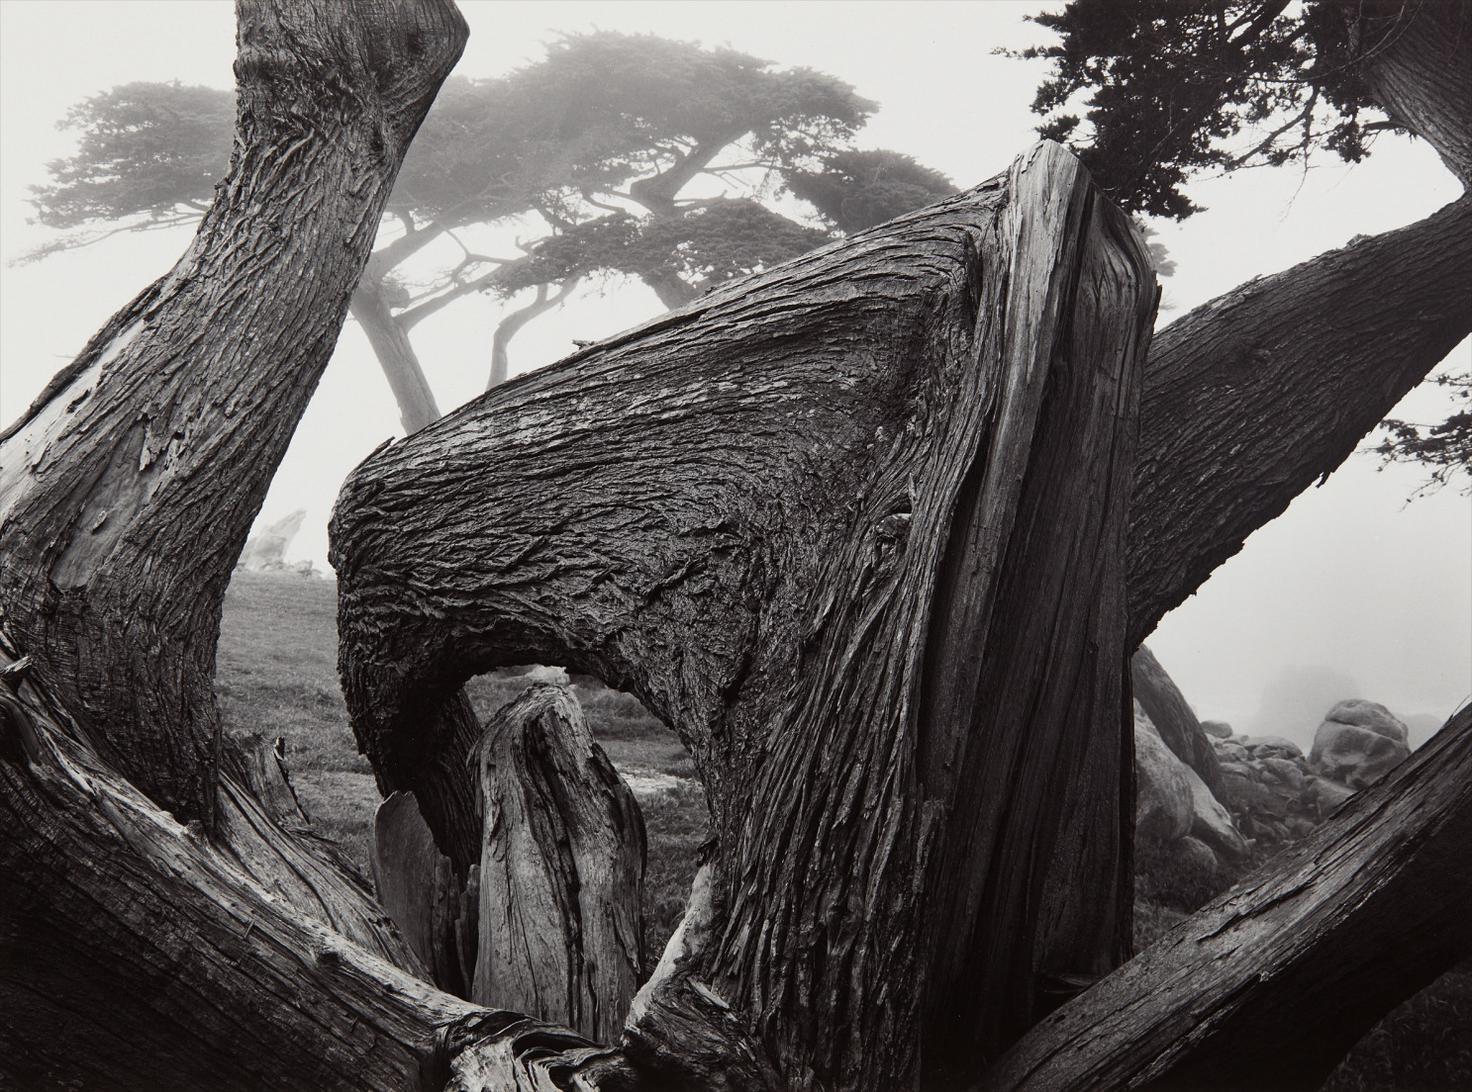 Ansel Adams-Cypress Tree In Fog, Pebble Beach, California-1967